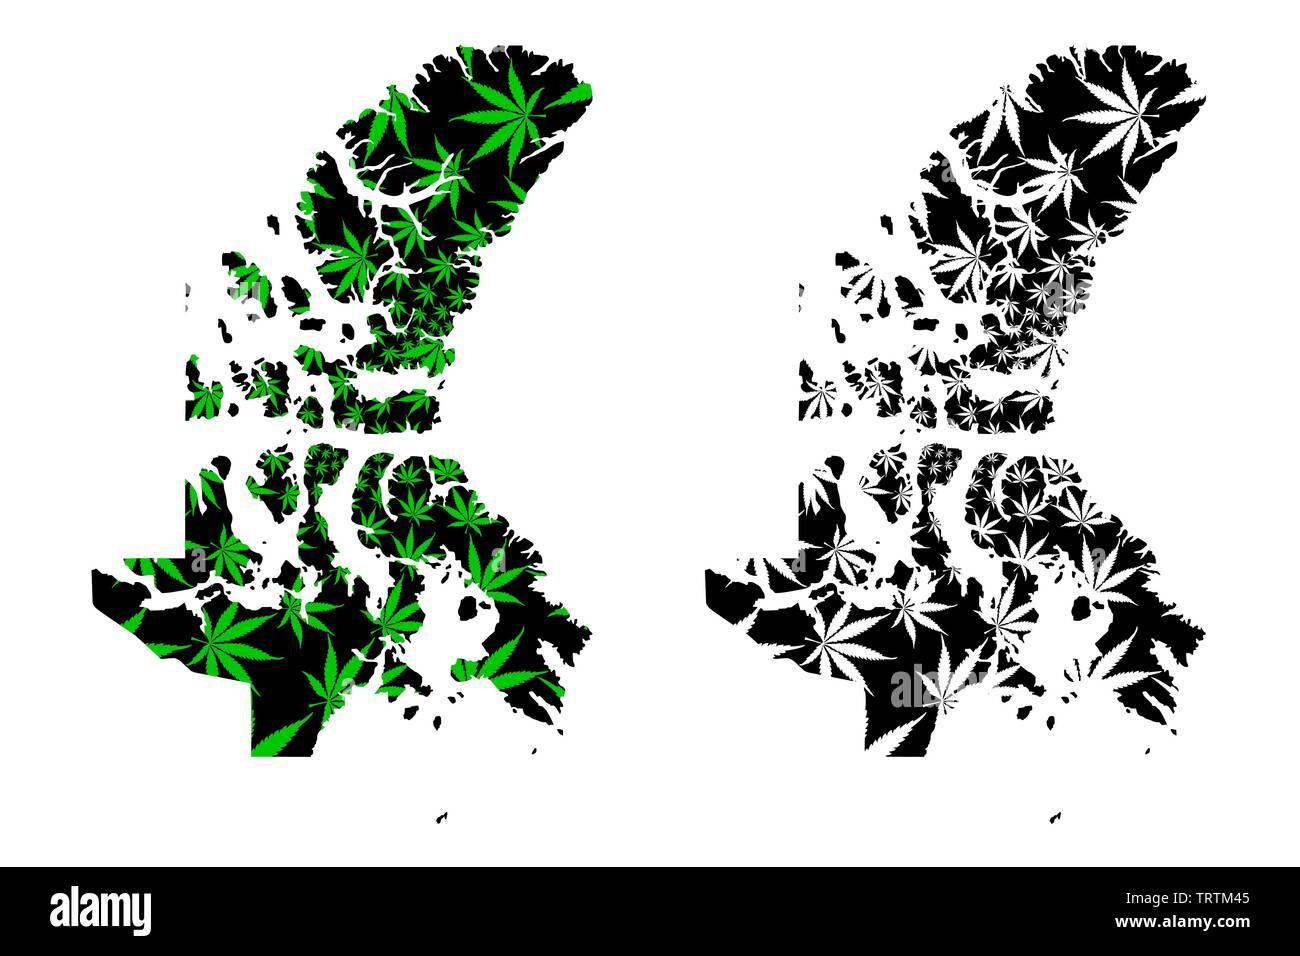 Nunavut (provinces and territories of Canada, Canadian Arctic Archipelago) map is designed cannabis leaf green and black, Nunavut map made of marijuan - Stock Image